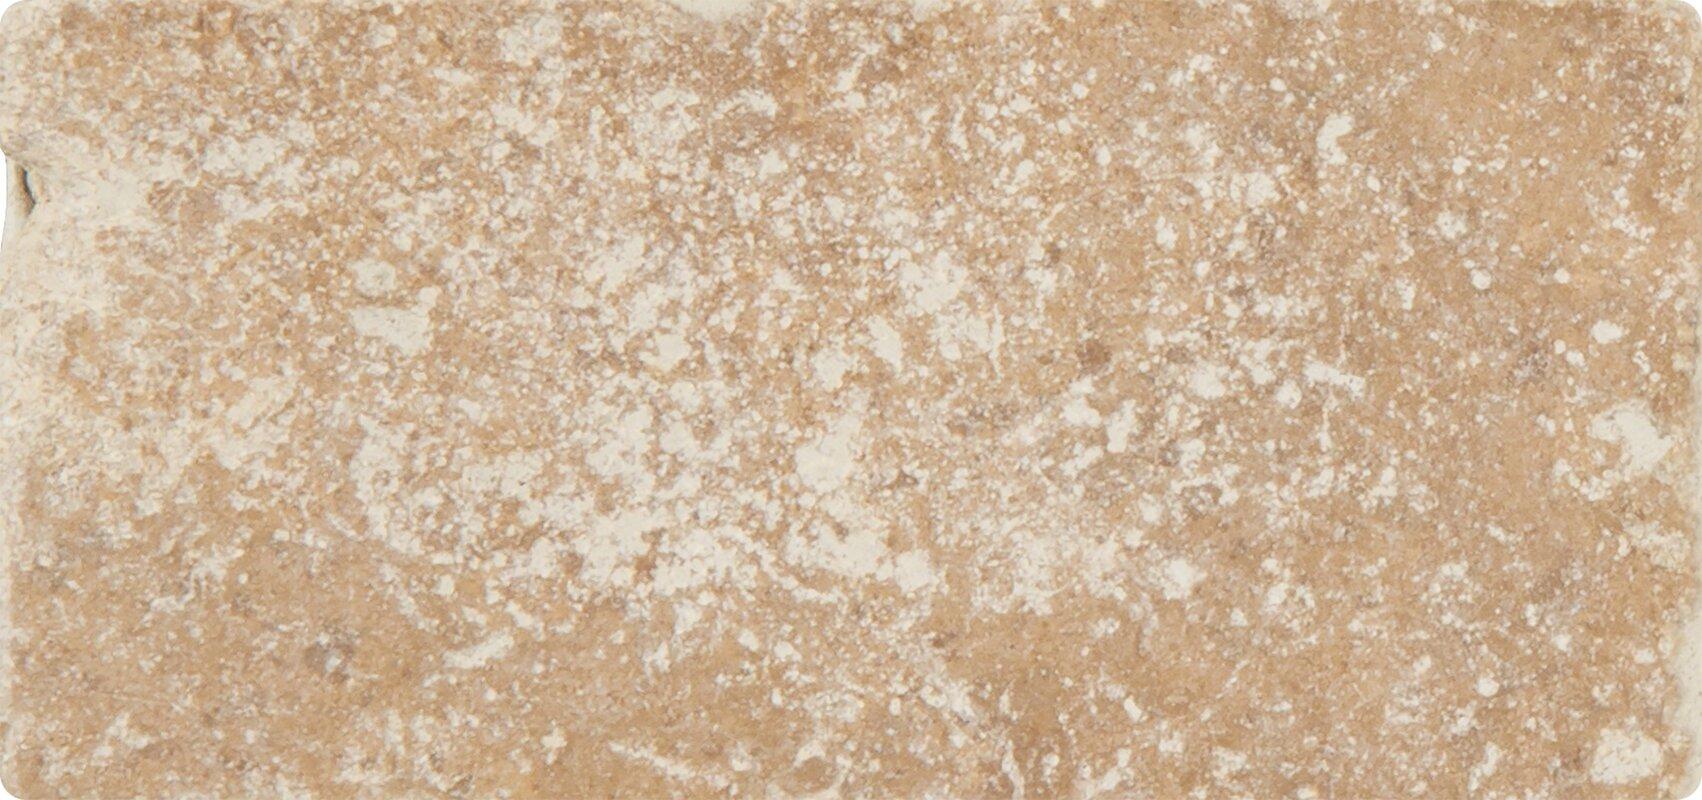 Msi tuscany walnut 3 x 6 travertine subway tile in tumbled tuscany walnut 3 x 6 travertine subway tile in tumbled brown doublecrazyfo Gallery